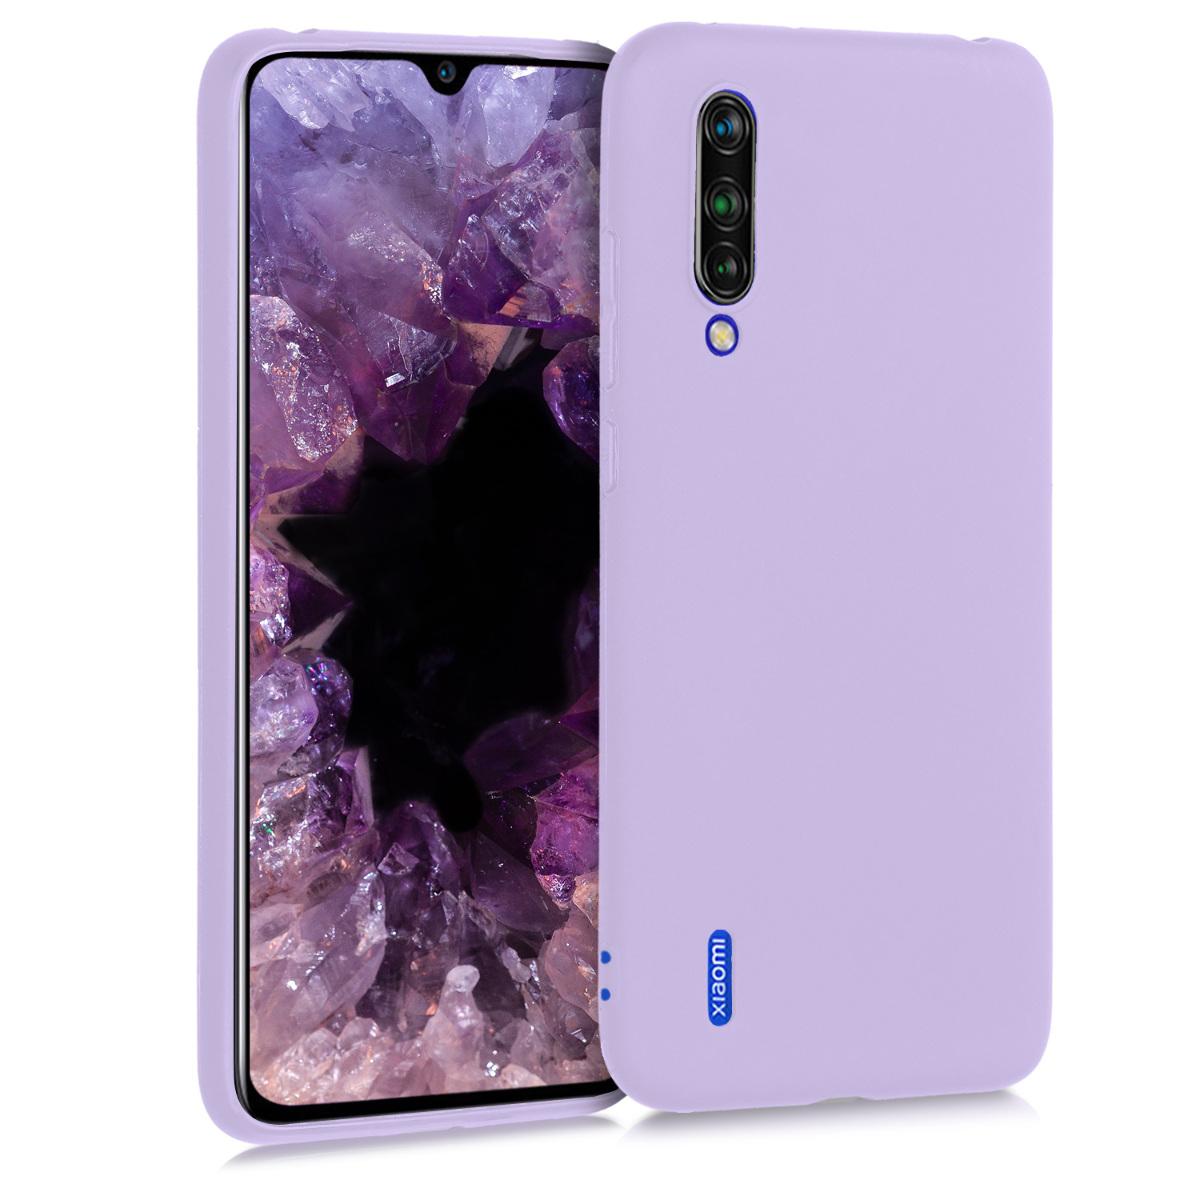 KW Θήκη Σιλικόνης Xiaomi Mi 9 Lite - Lavender (50582.108)